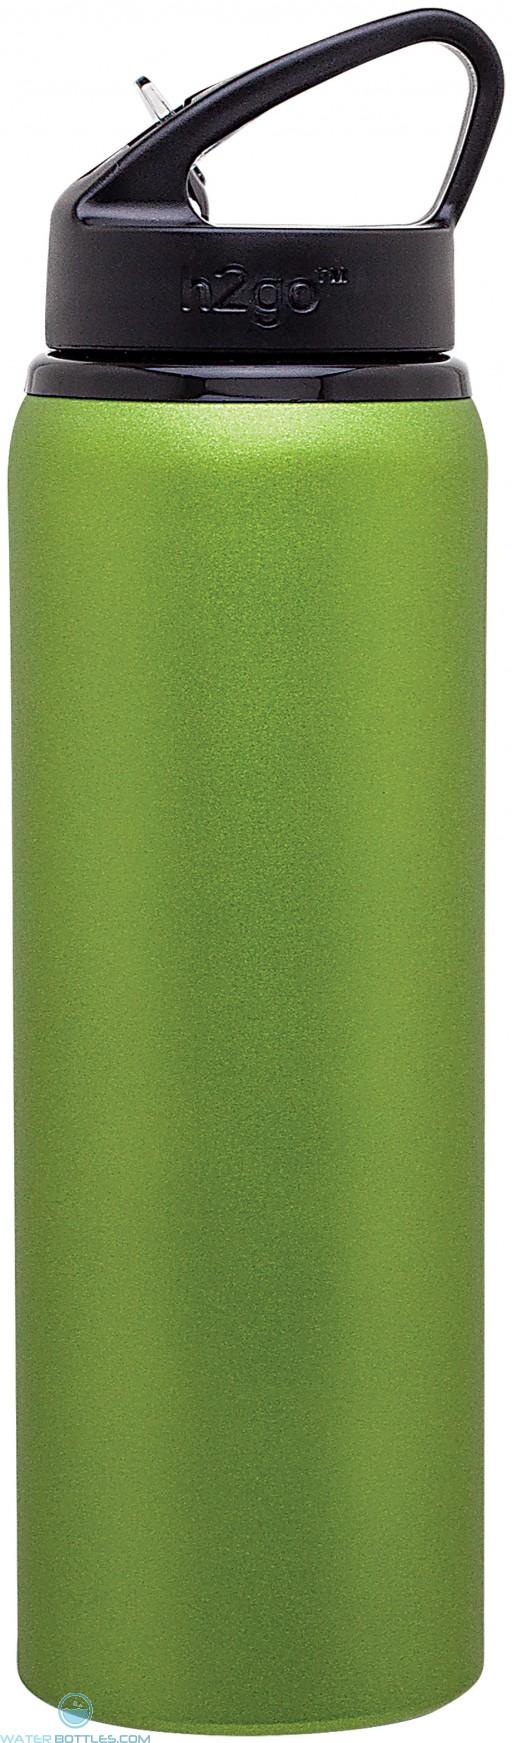 H2Go Allure Aluminum Water Bottles | 28 oz - Matte Lime